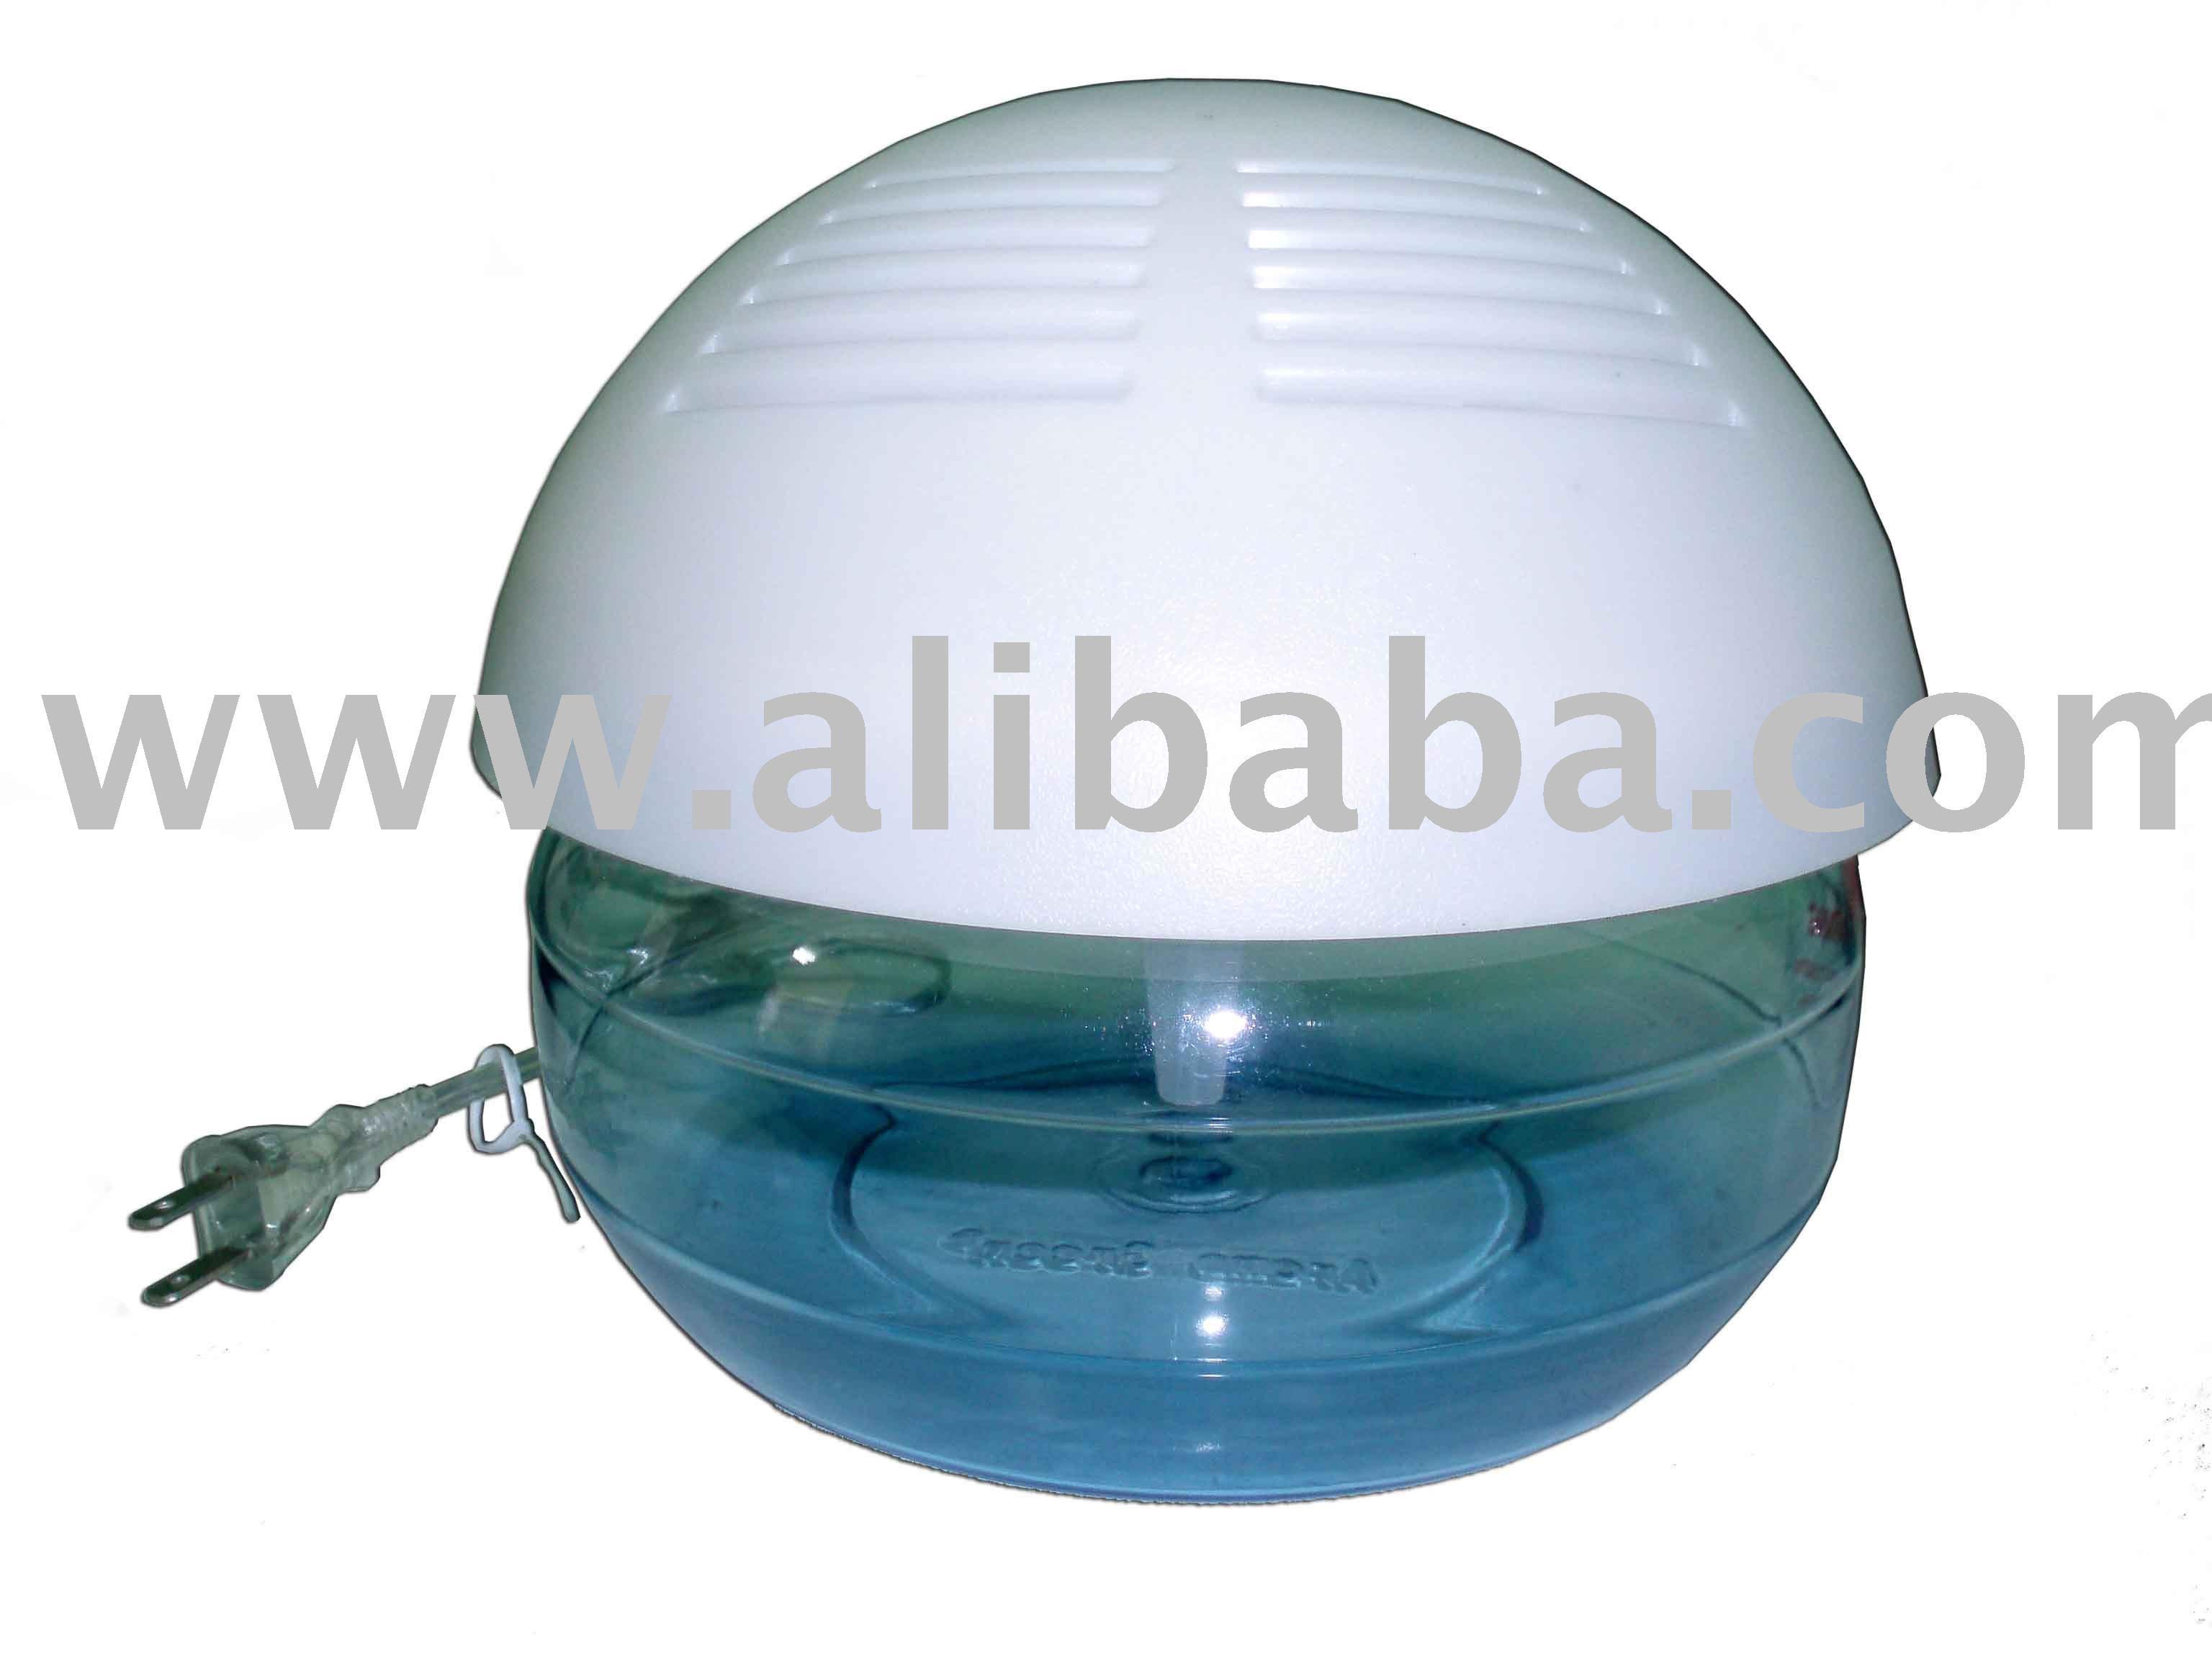 Air Revitalisor Air Purifier Buy Air Revitalisor Product on Alibaba  #124B5E